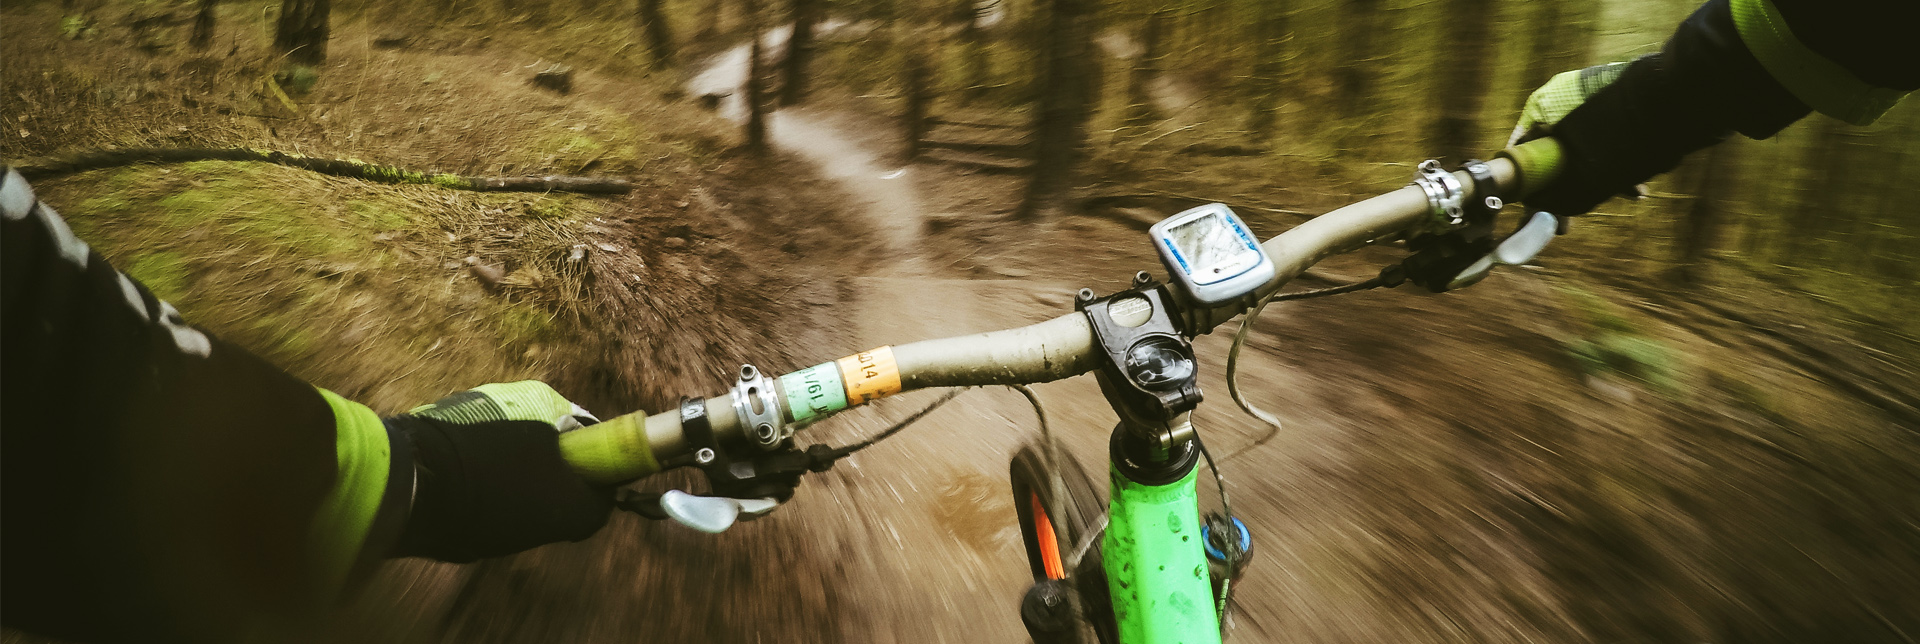 Oasi Zegna - Mountainbike